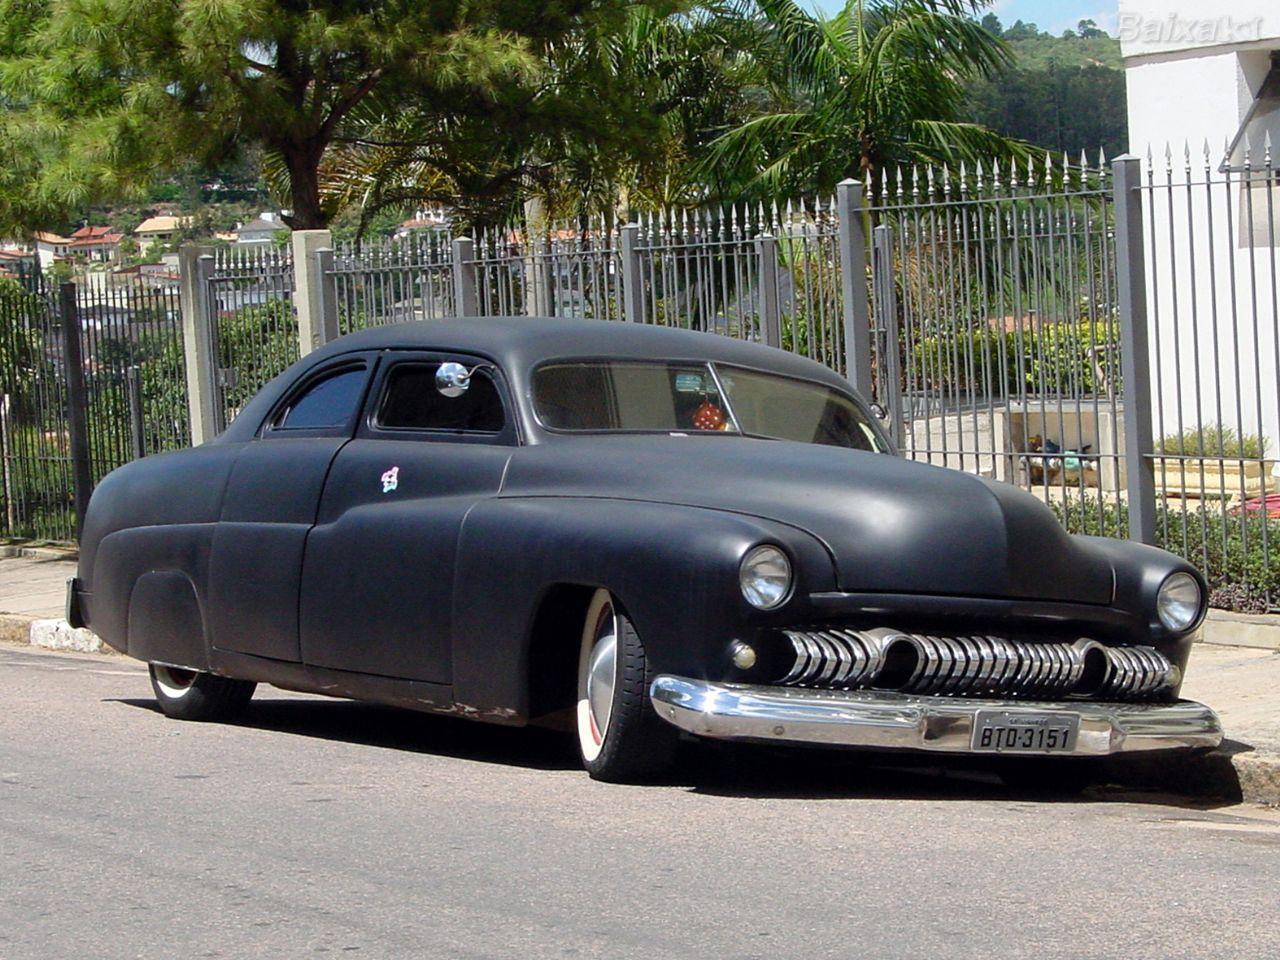 Машина из фильма Кобра